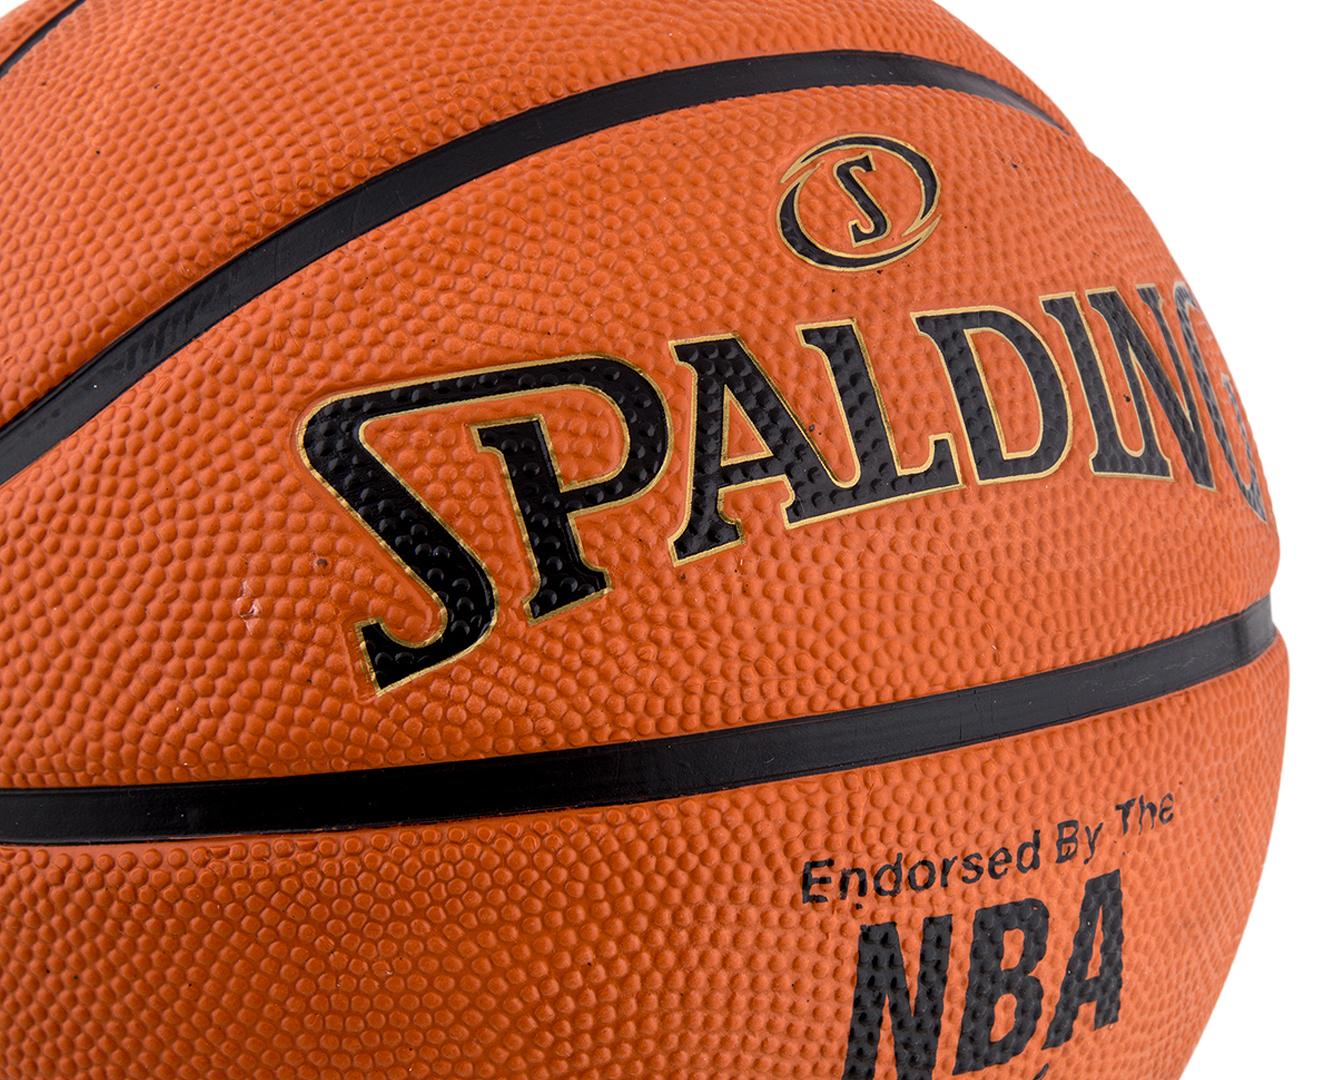 SPALDING NBA Logoman Basketball - Size 7